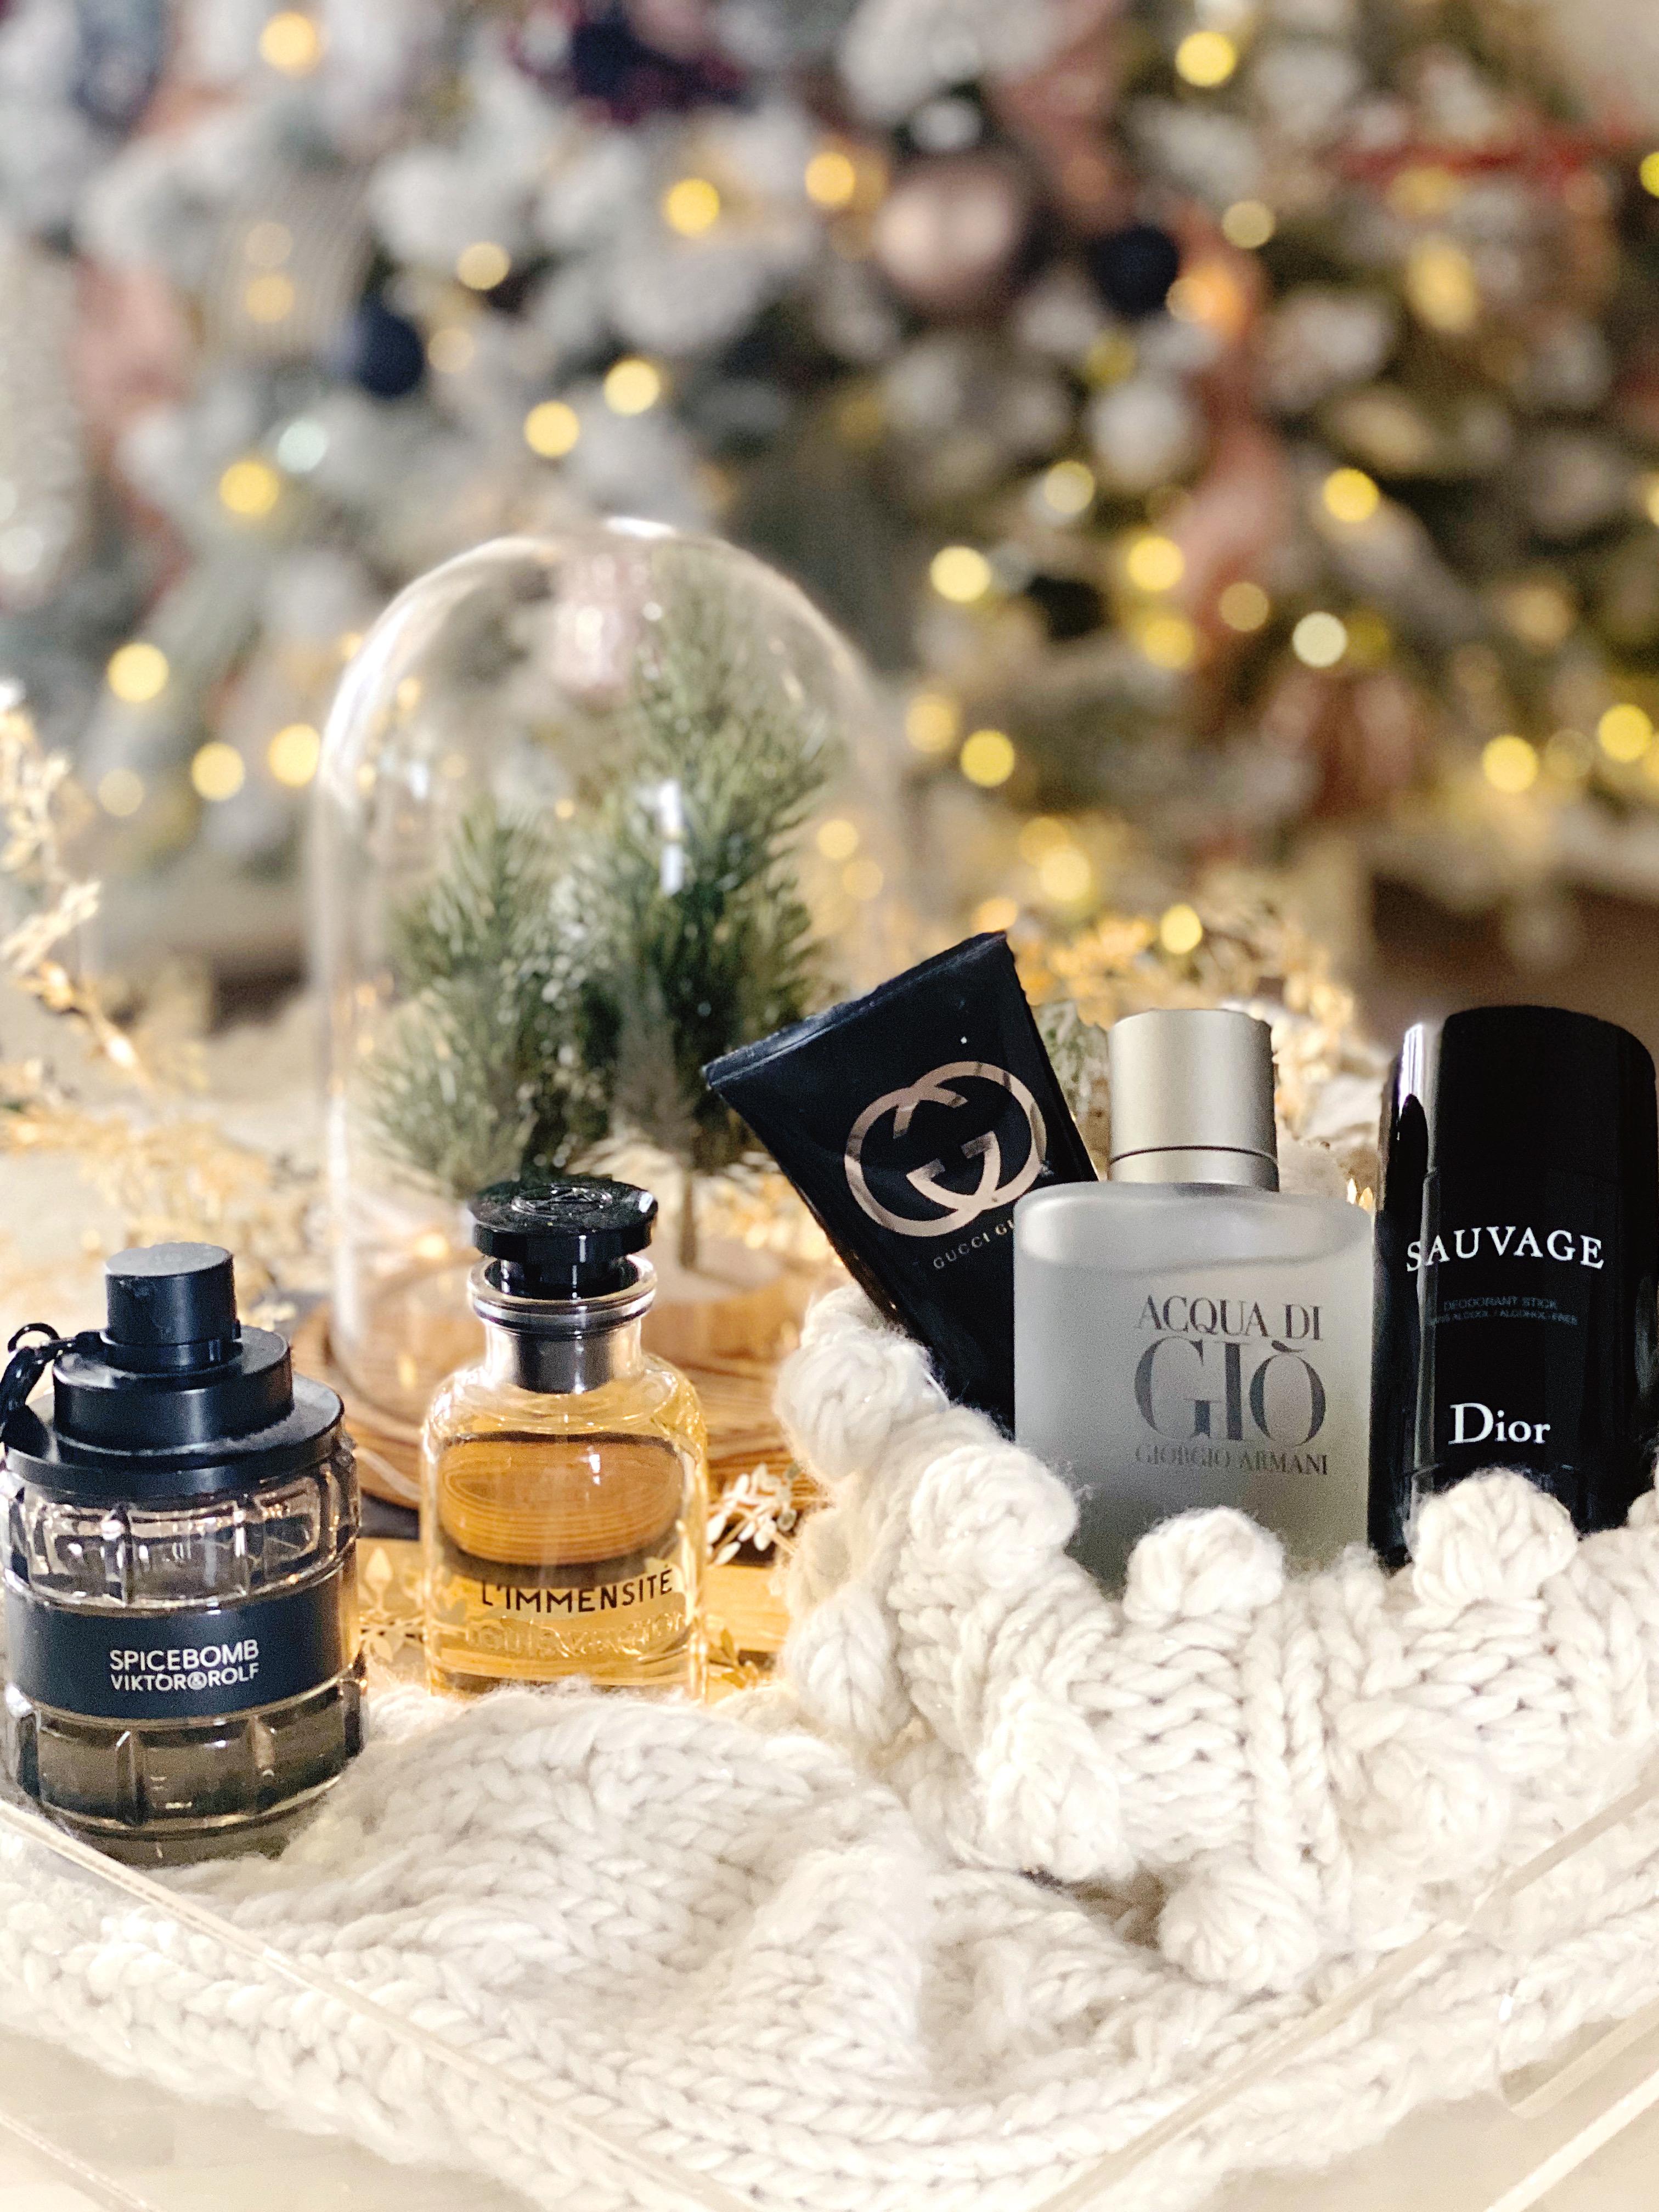 Nordstrom Favorites and Gifts | Fragrances